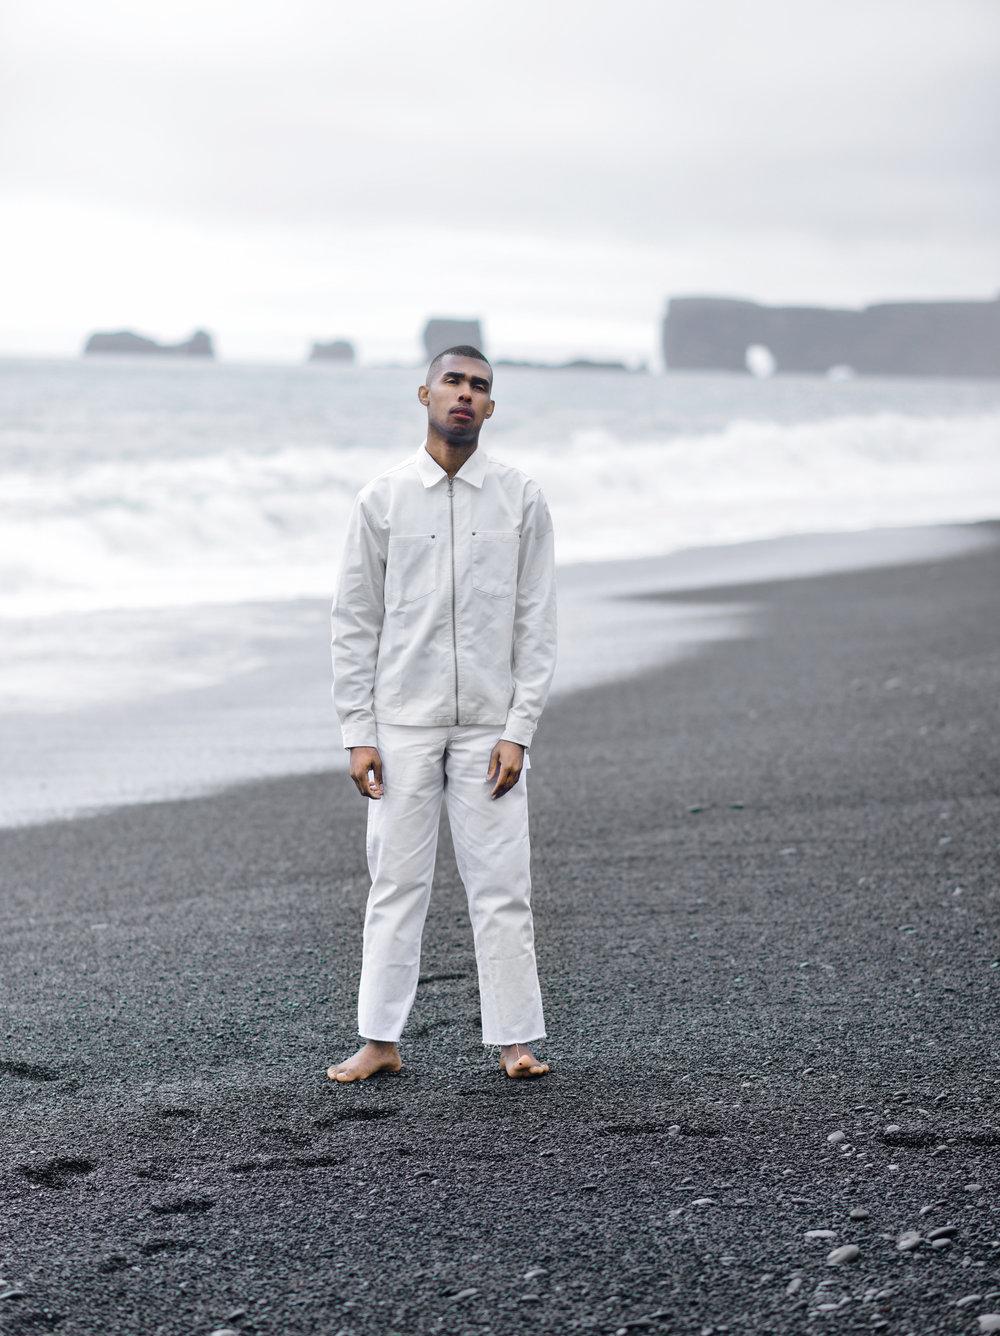 The-Look-Principle-Editorial-Reynisfjara-Beach-1.jpg